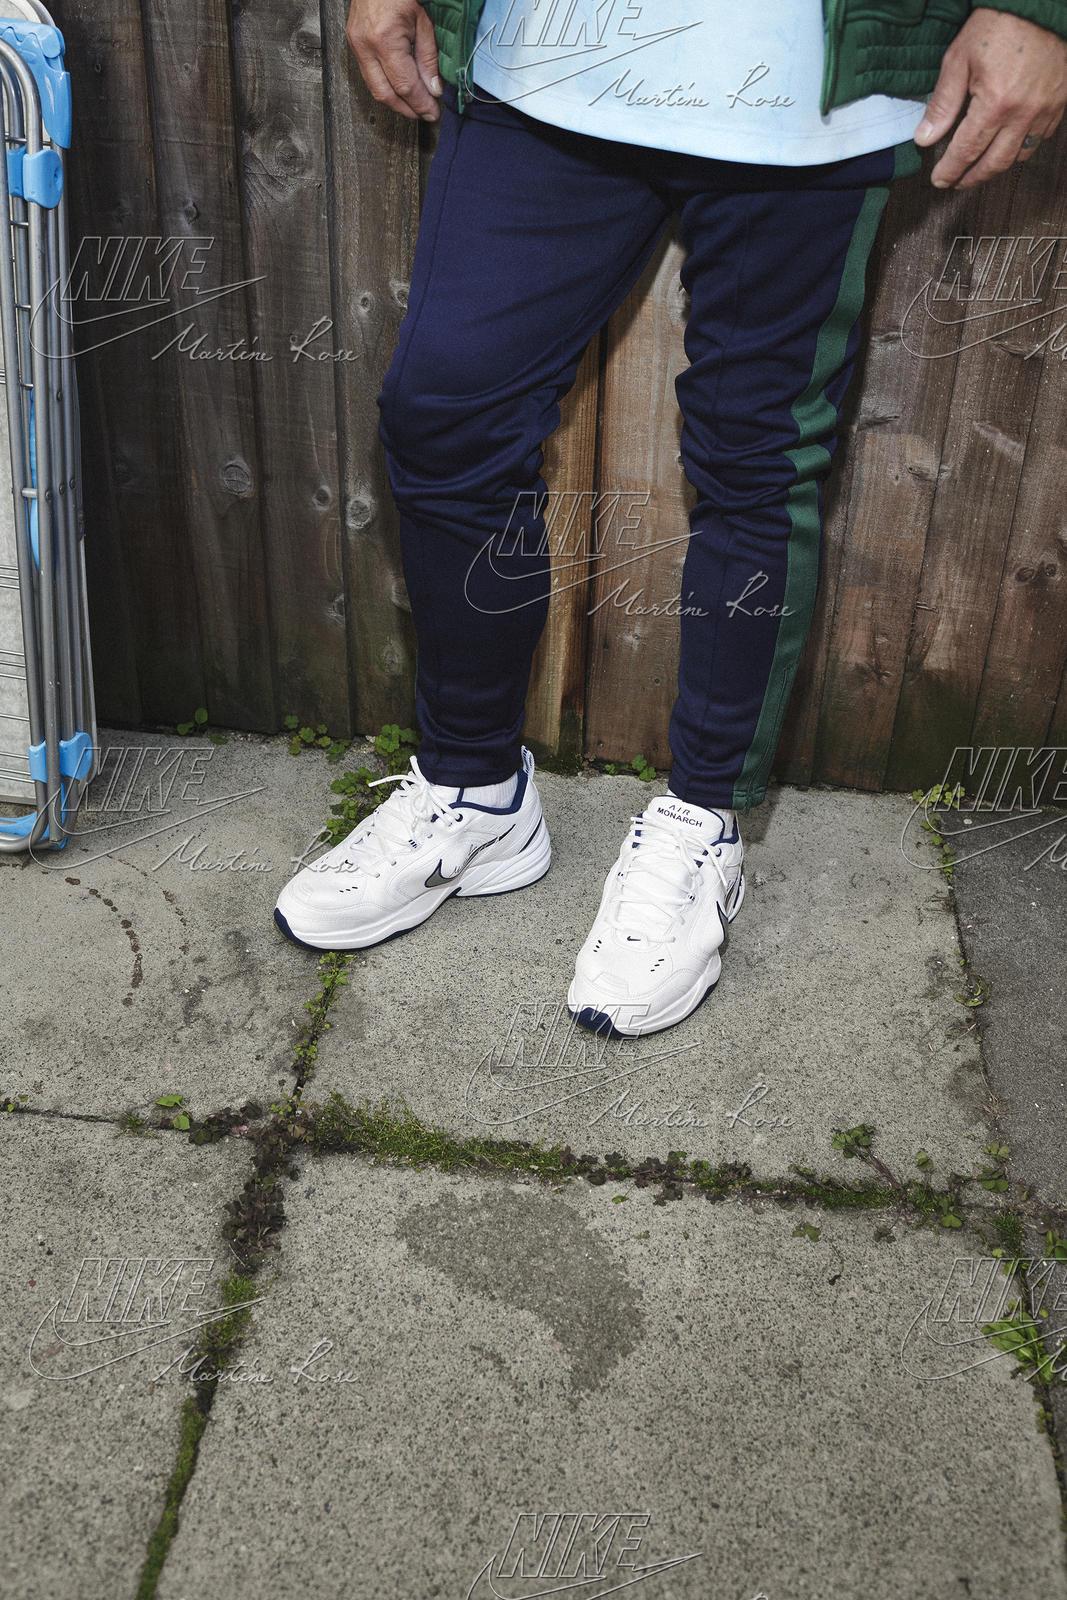 Martine Rose x Nike | Collater.al 5